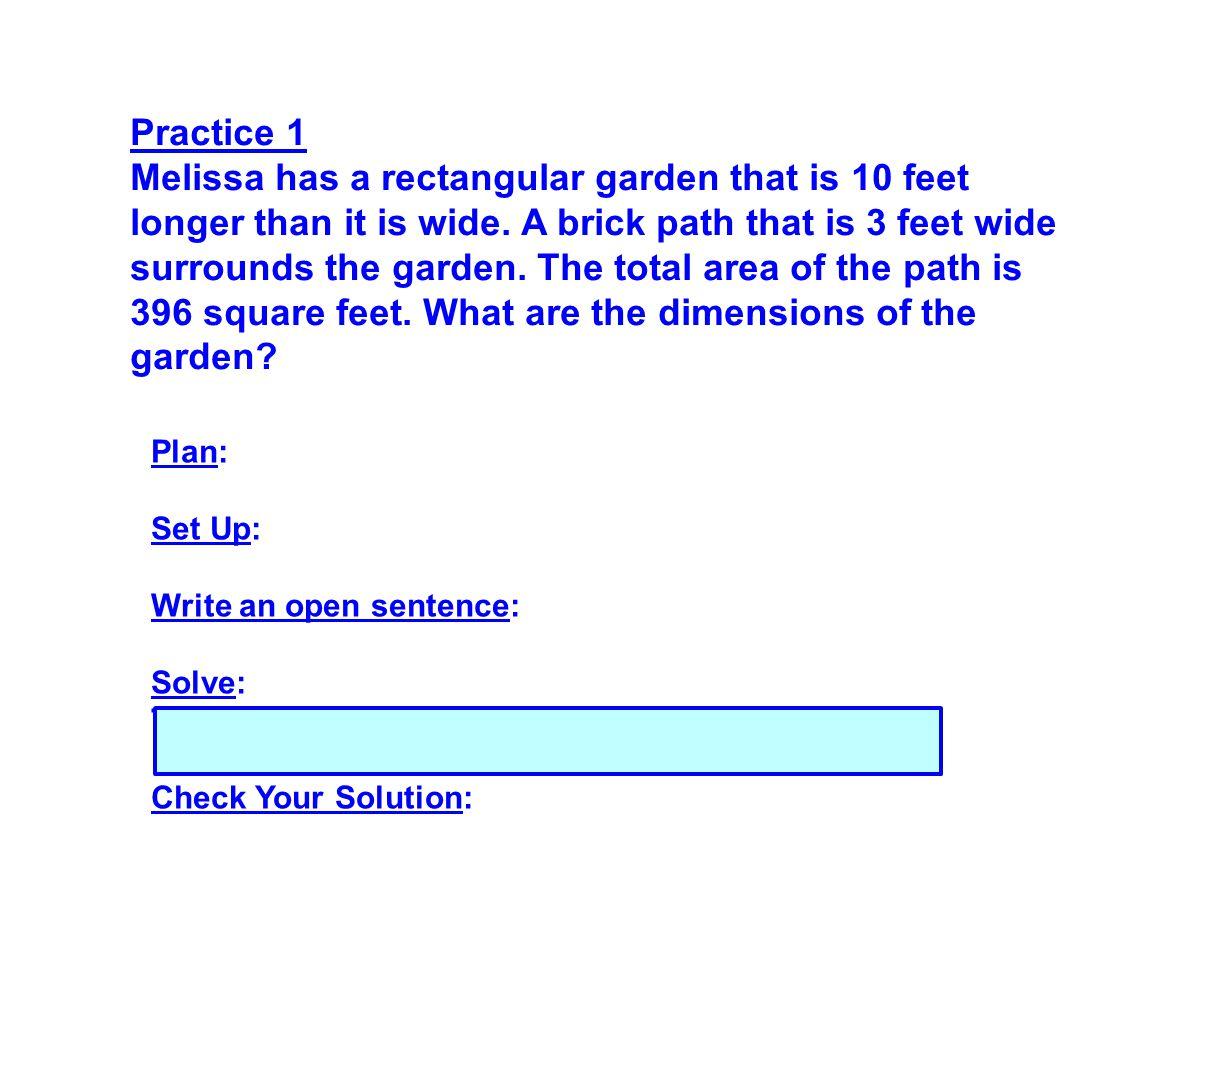 Practice 1 Melissa has a rectangular garden that is 10 feet longer than it is wide. A brick path that is 3 feet wide surrounds the garden. The total a